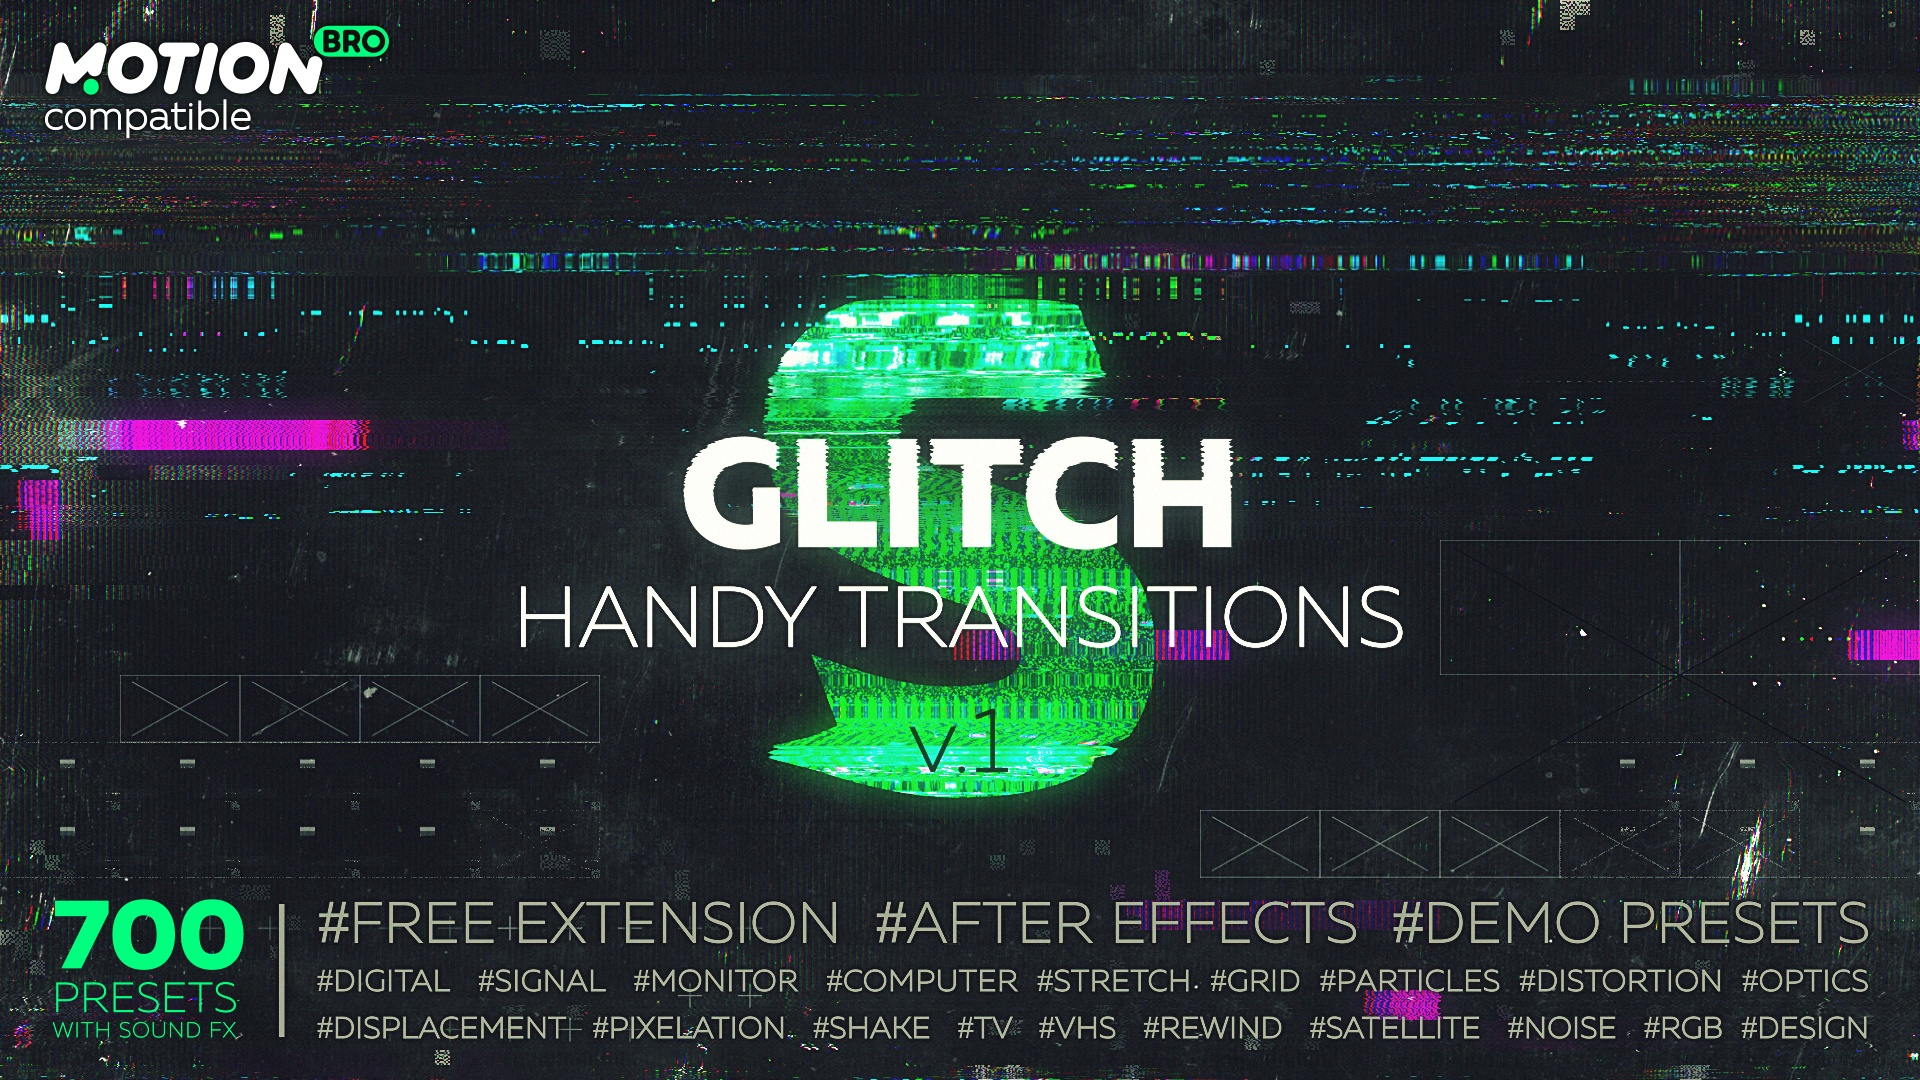 Glitch Handy Transitions – VIDEOLANCER